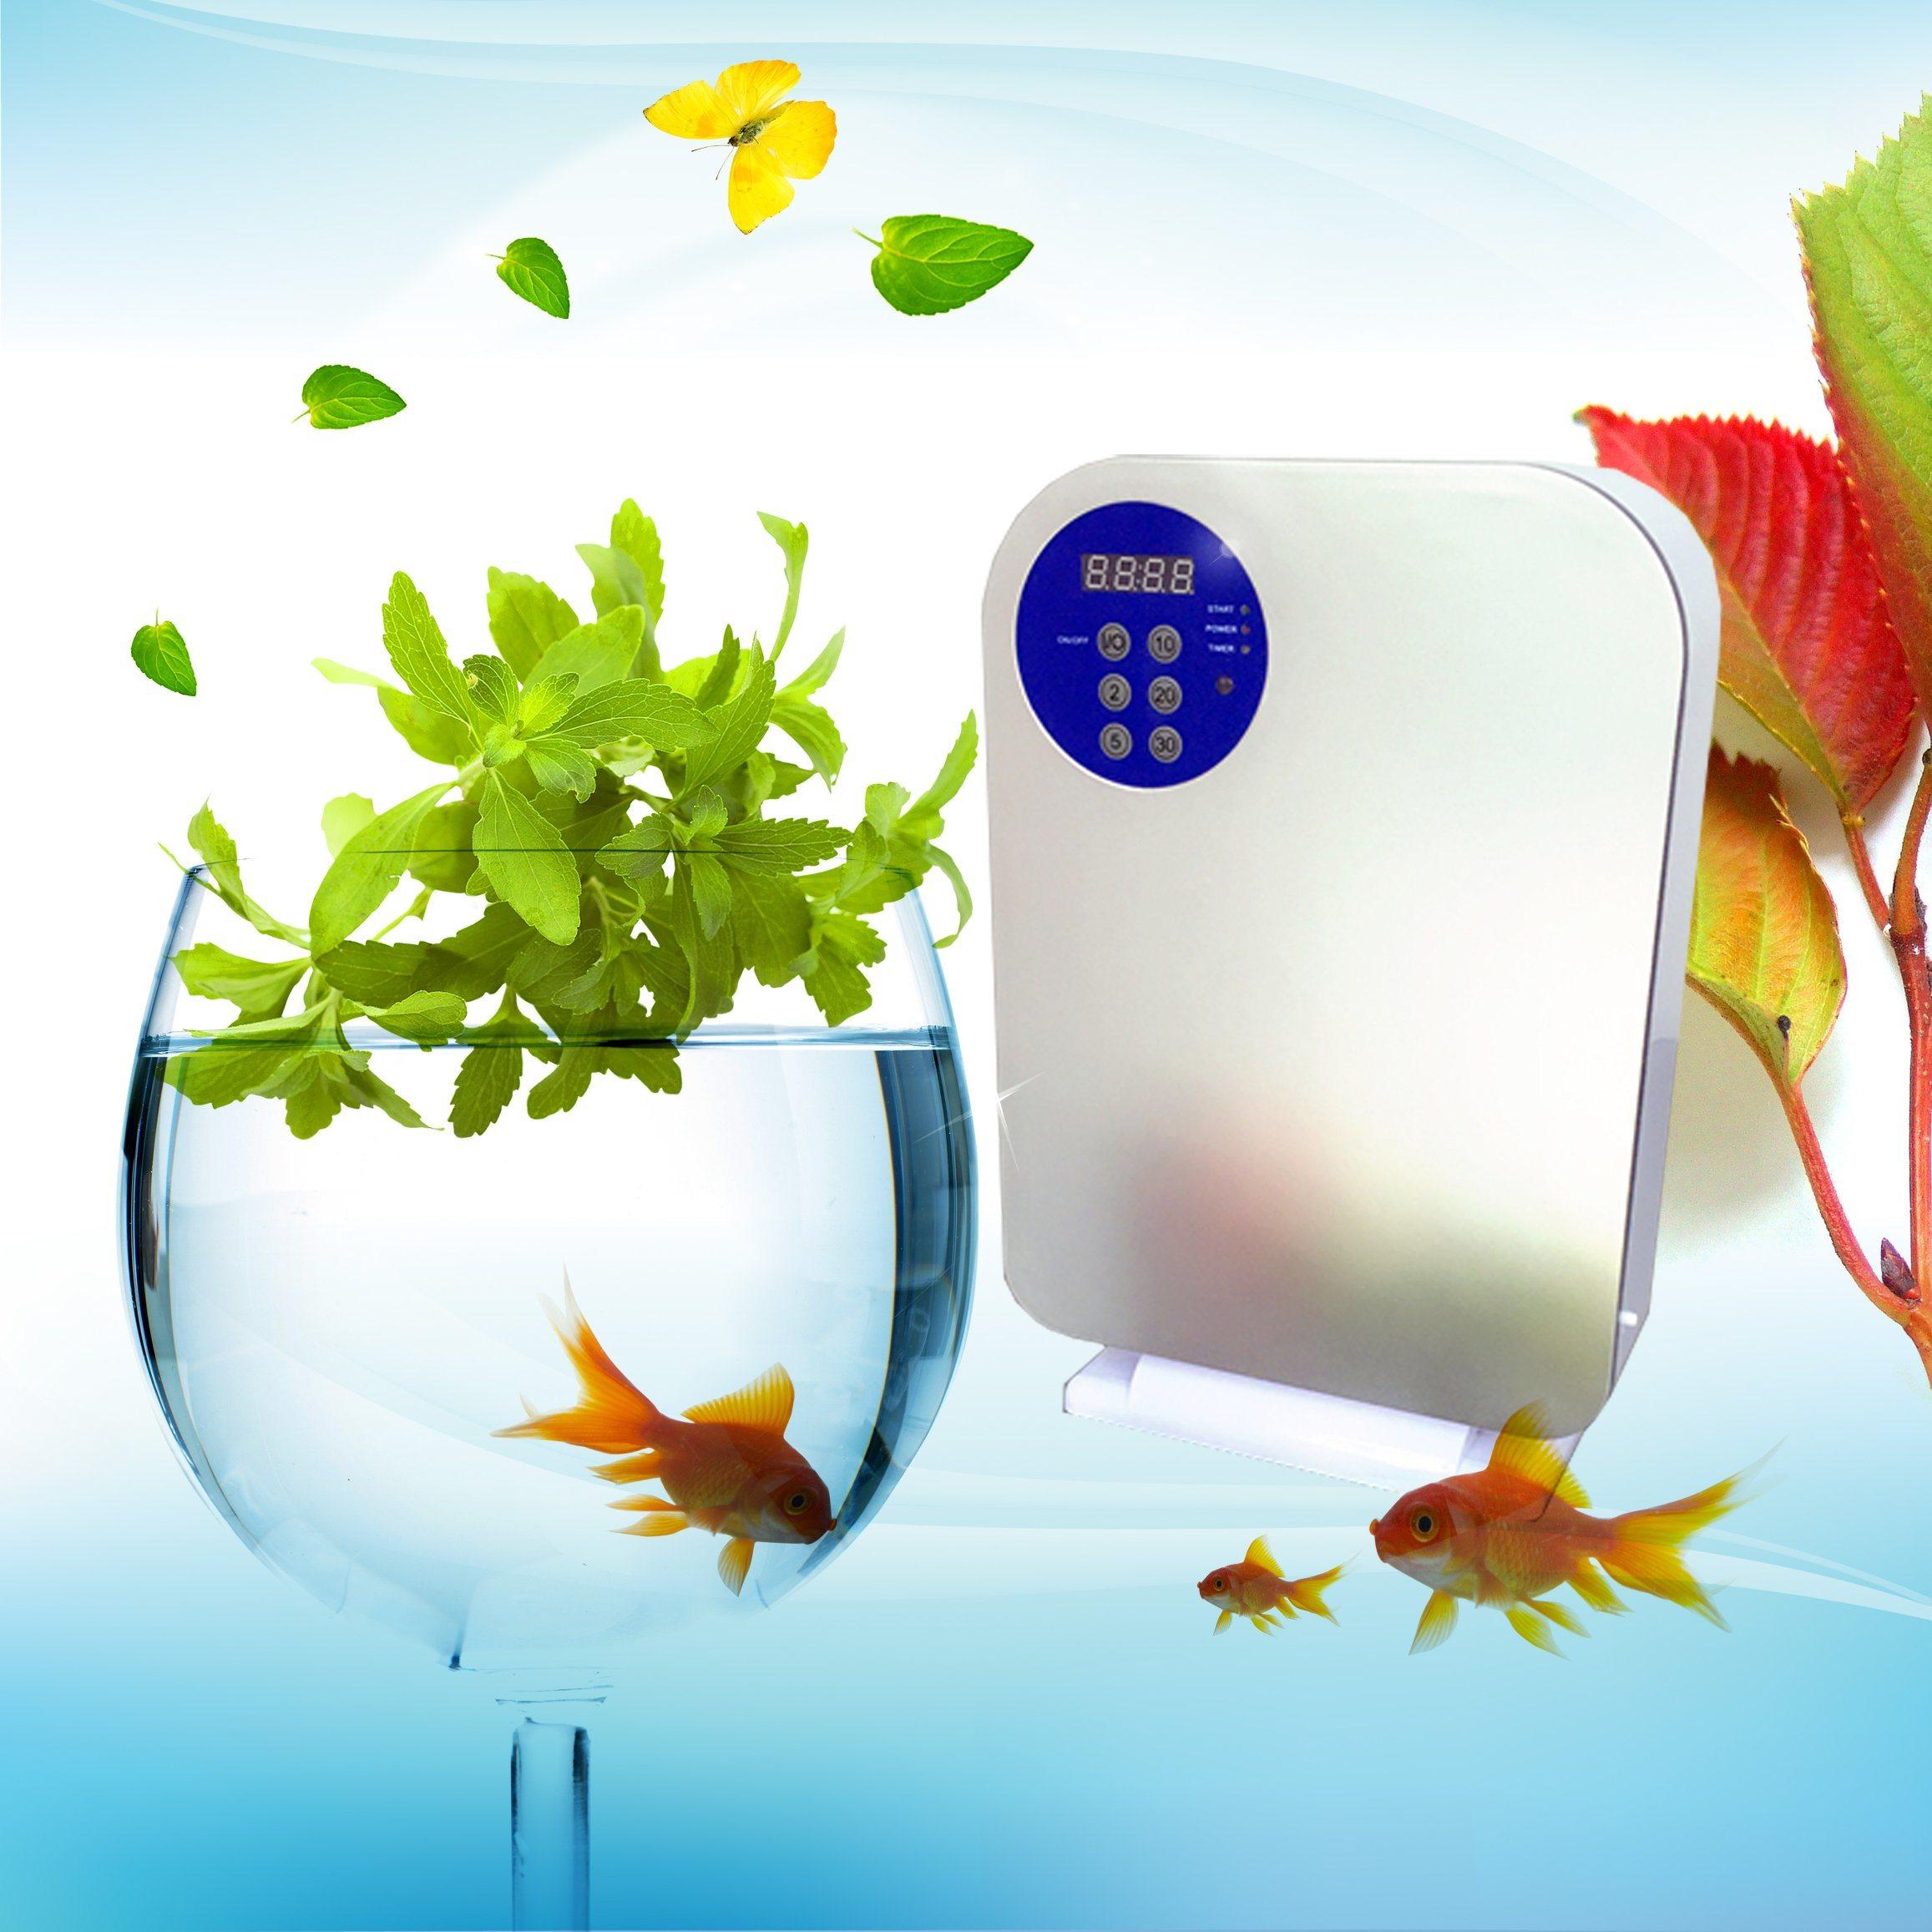 400mg/H Domestic Ozone Machine Ozone Generator Ozone Fruit and Vegetable Washer HK-A3